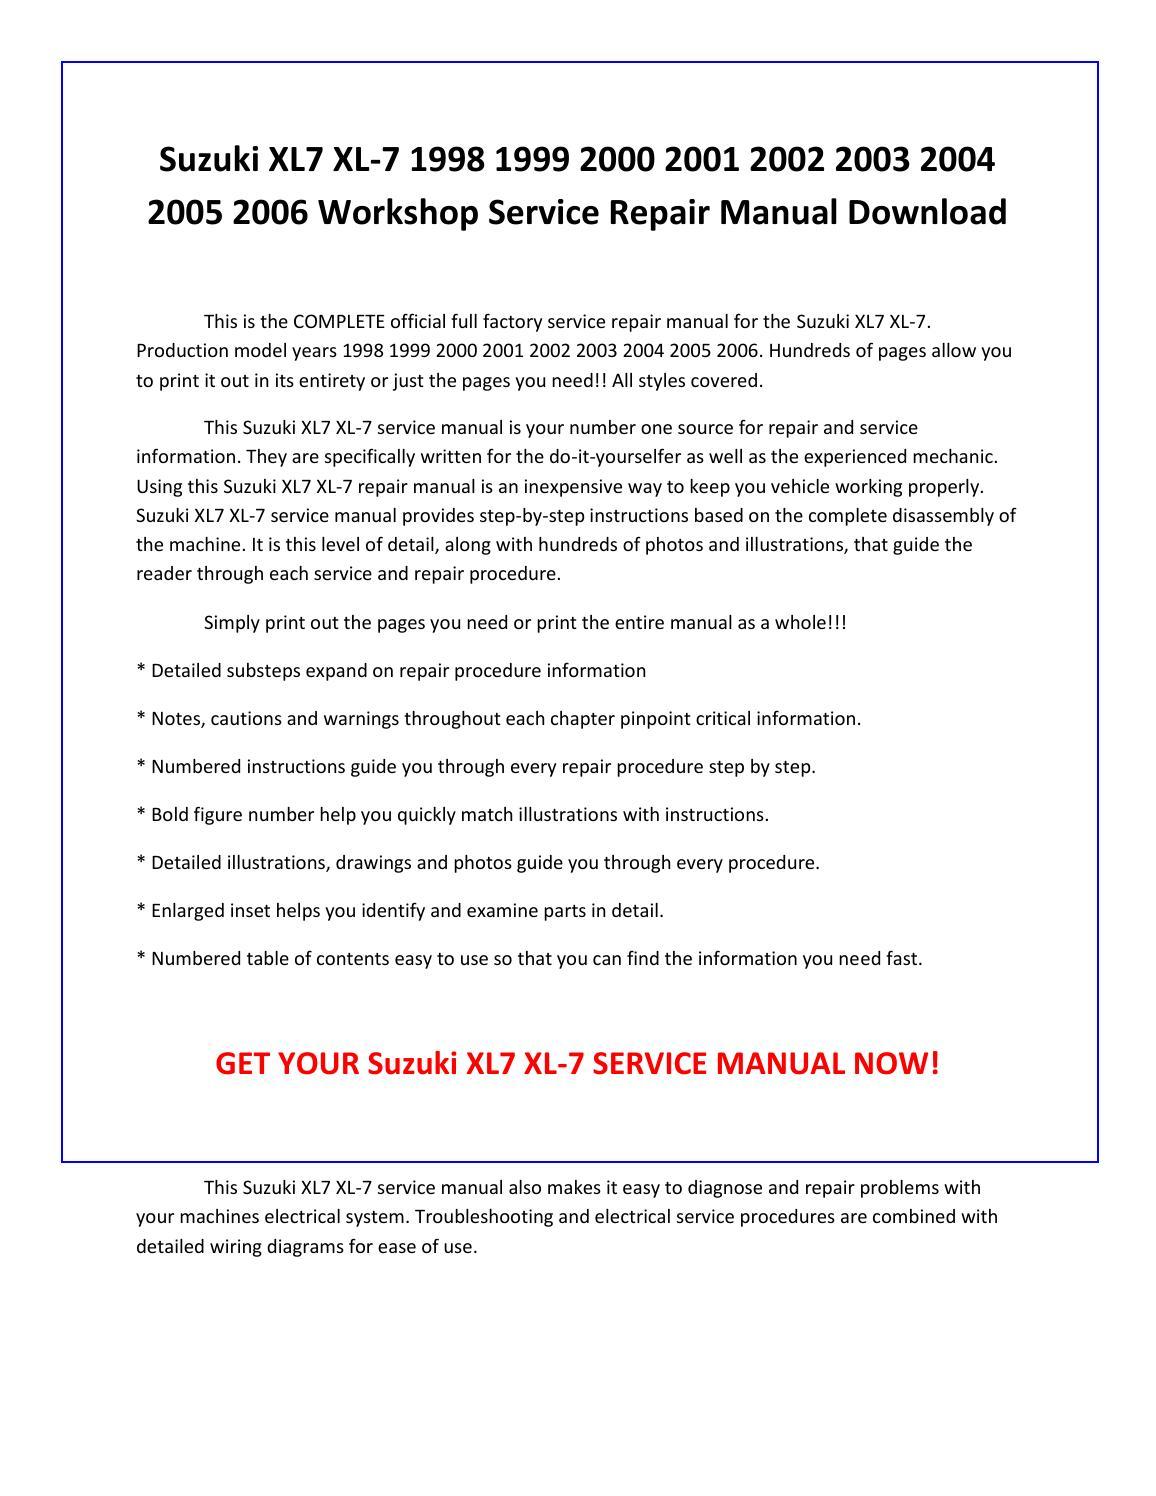 Free repair manual 2006 suzuki xl7